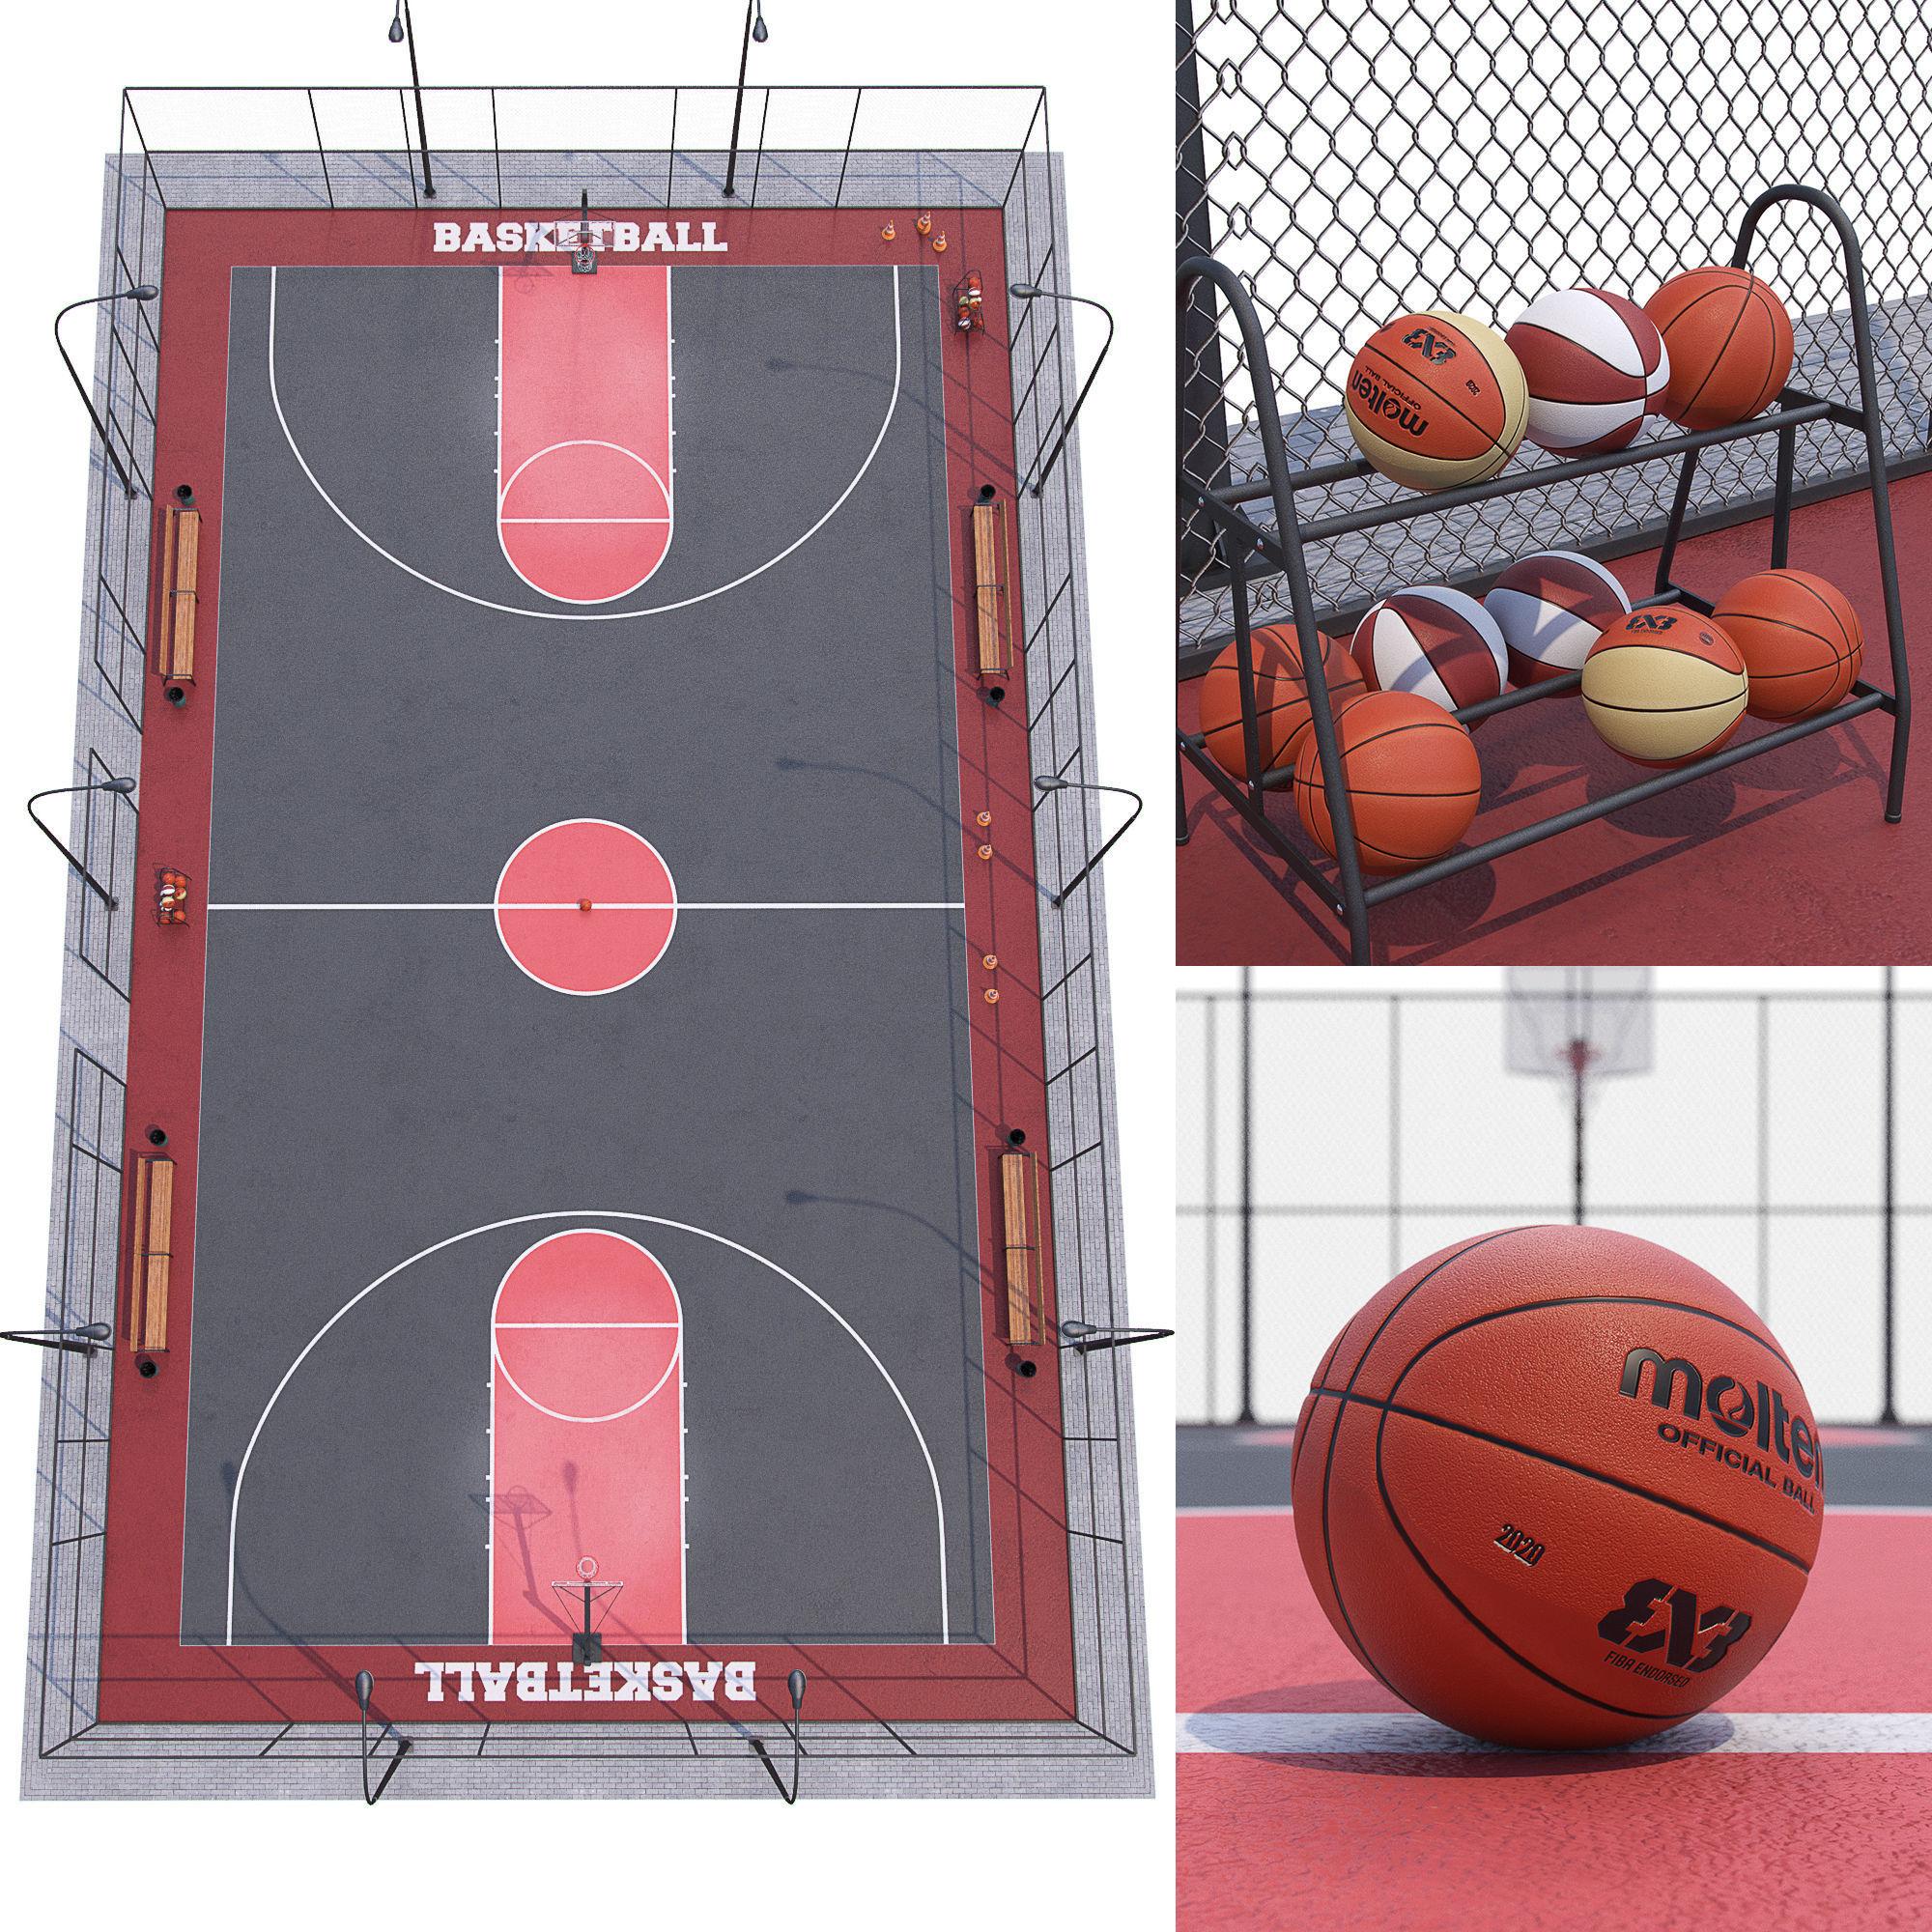 Basketball court Hq